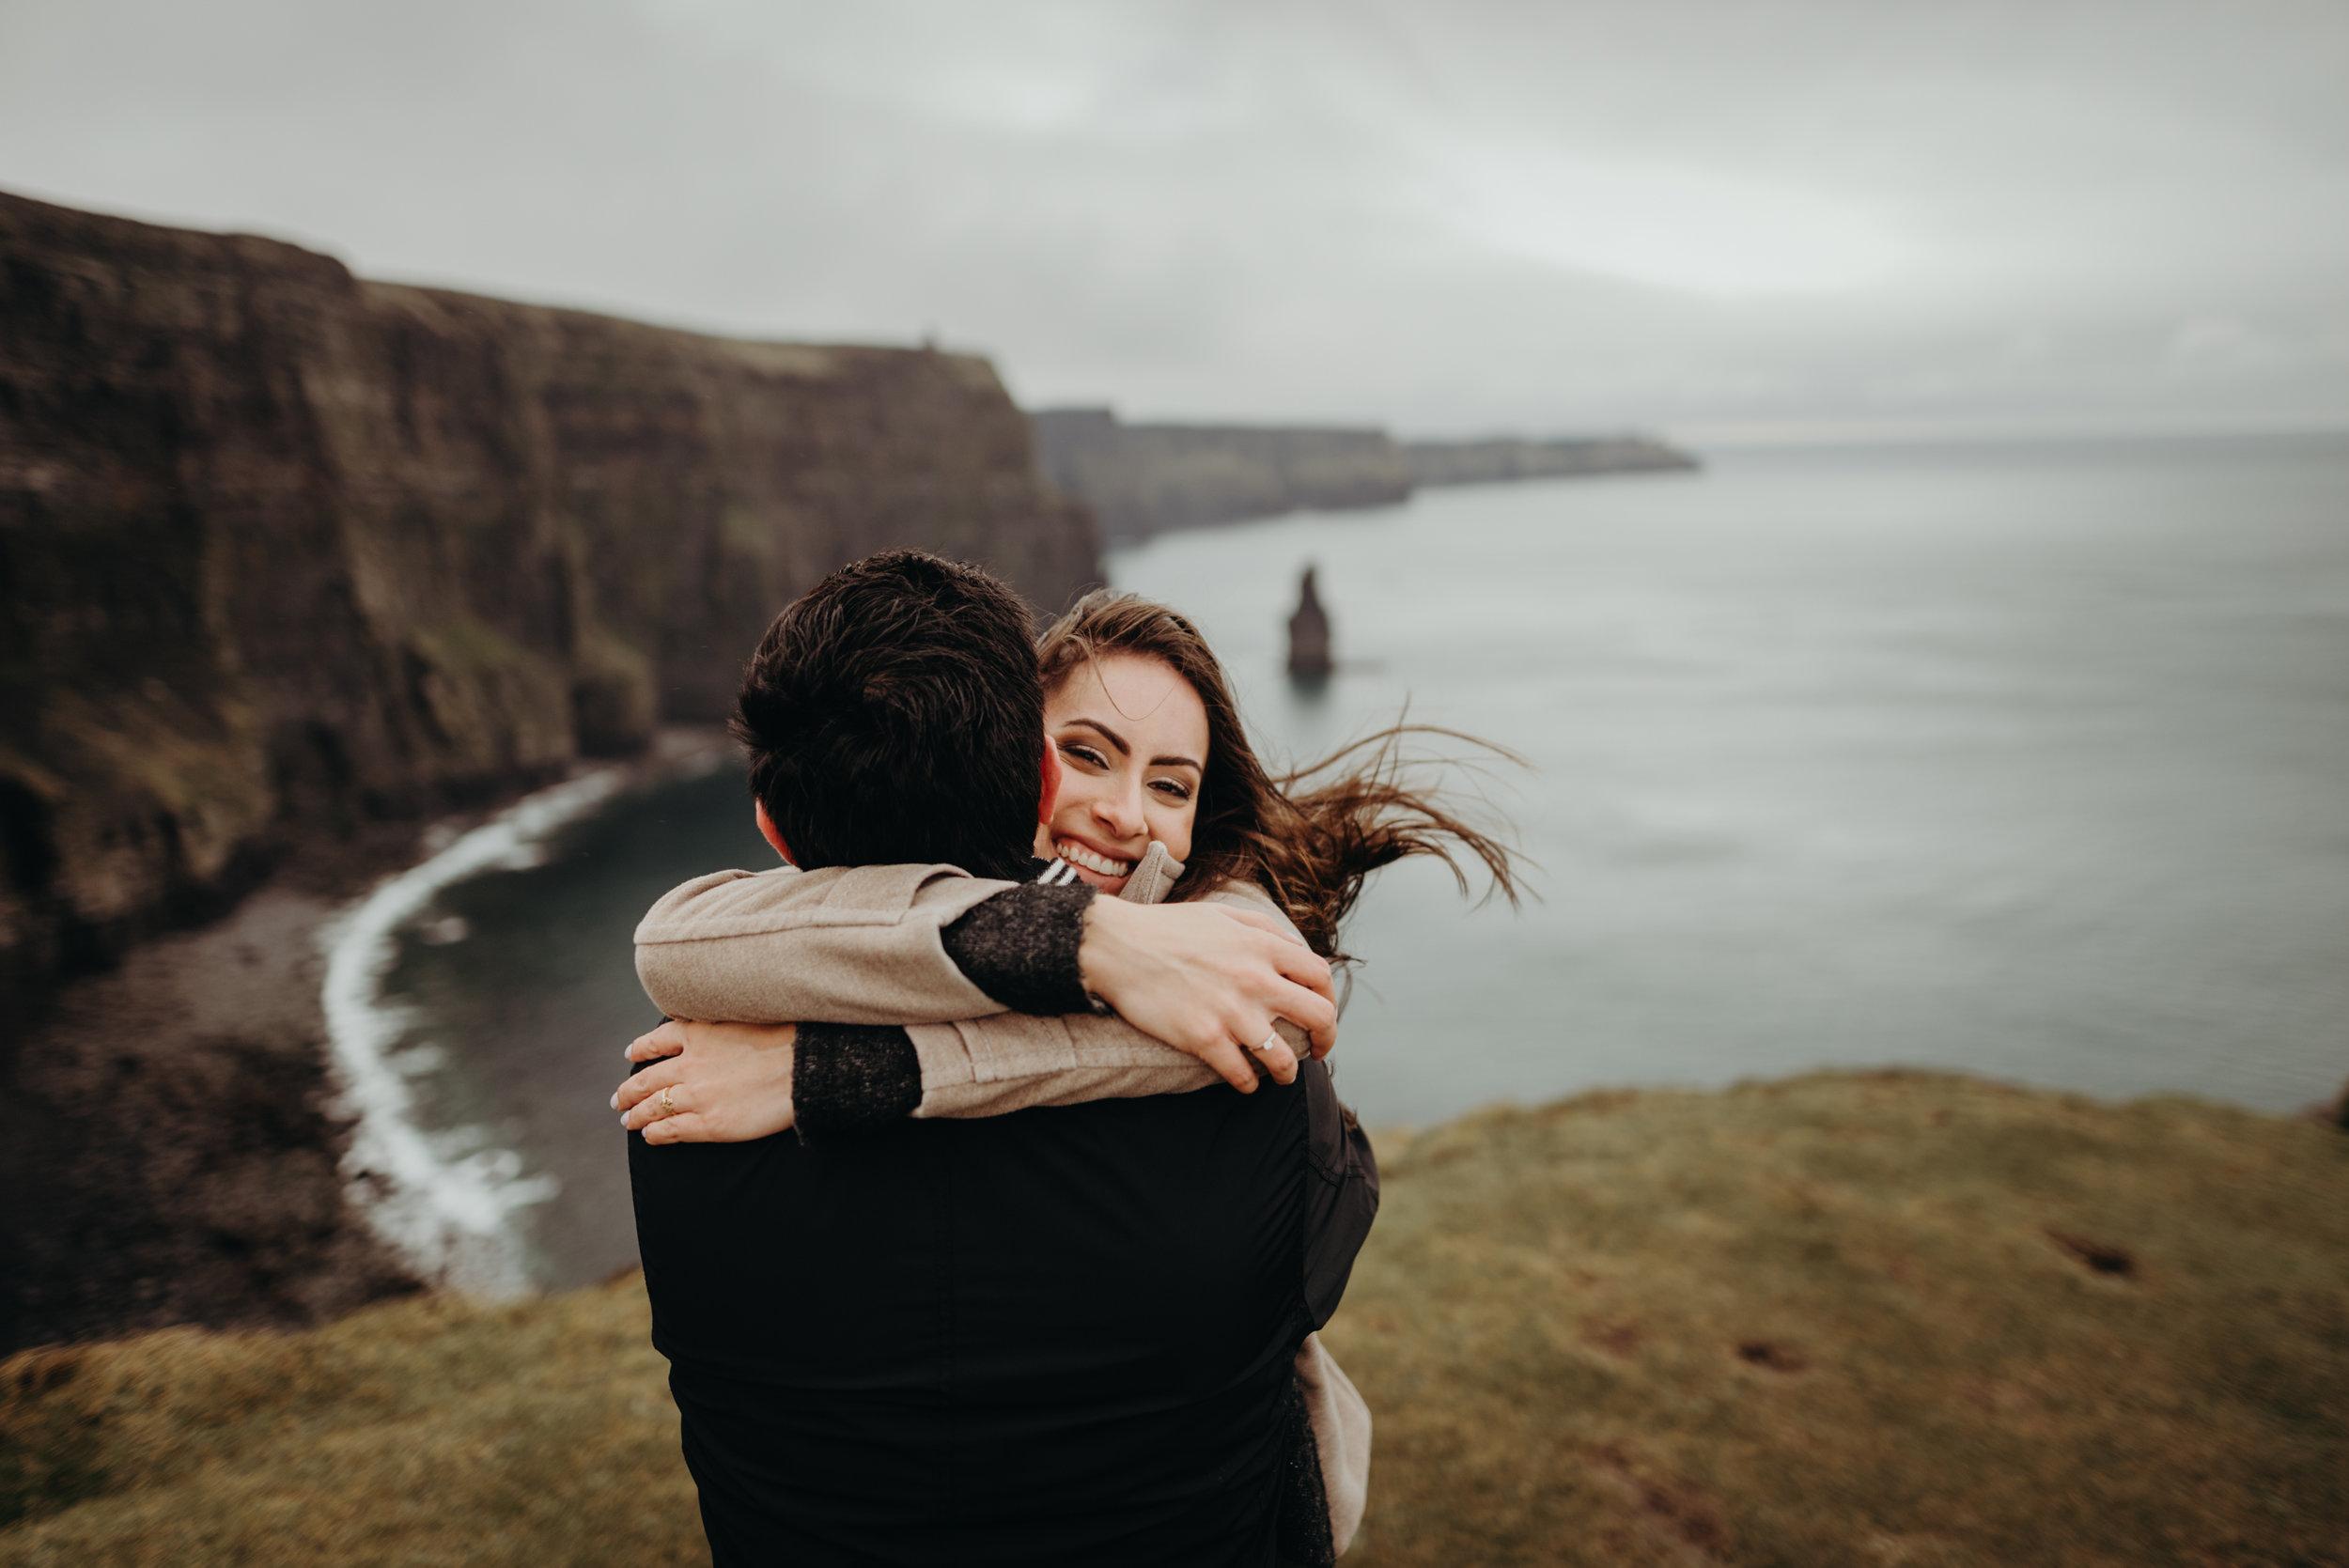 Cliffs Of Moher Engagement Session - Cliffs of Moher Proposal - Cliffs of Mhoer Elopement_5429-Edit-5.jpg